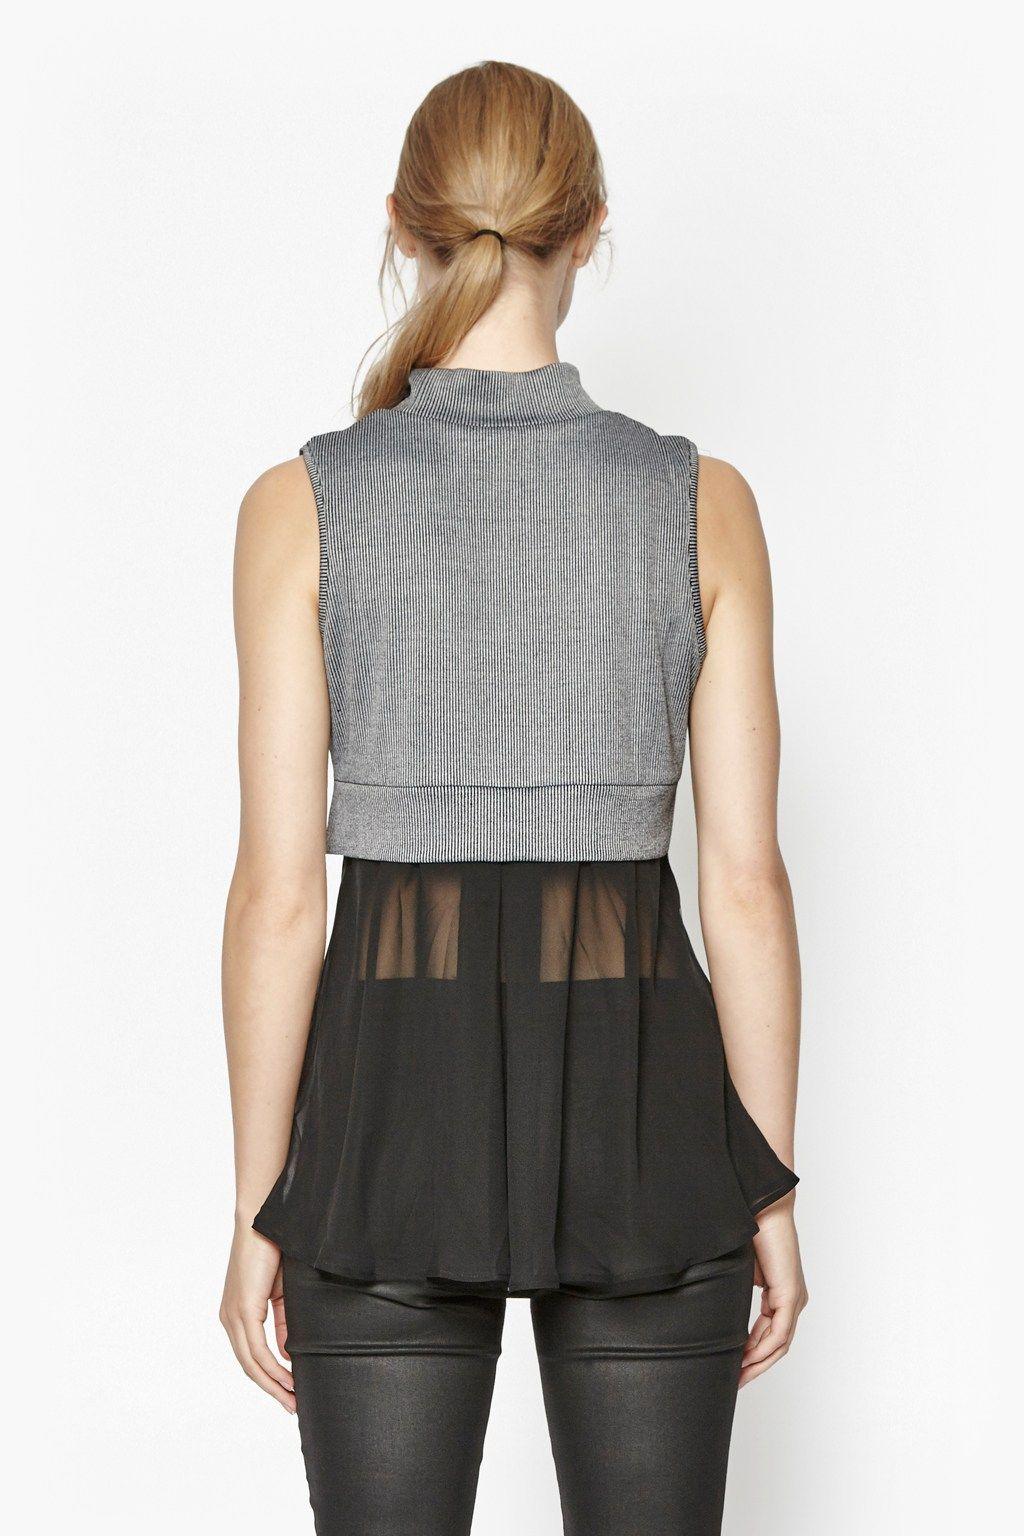 "<ul> <li> Layered high neck top</li> <li> Ribbed-knit body</li> <li> Semi-sheer chiffon hem and back panel</li> <li> Slips on</li> <li> UK size S back length is 69cm</li> </ul>  <strong>Our model is 5ft 9.5"" and is wearing a UK size S.</strong>"